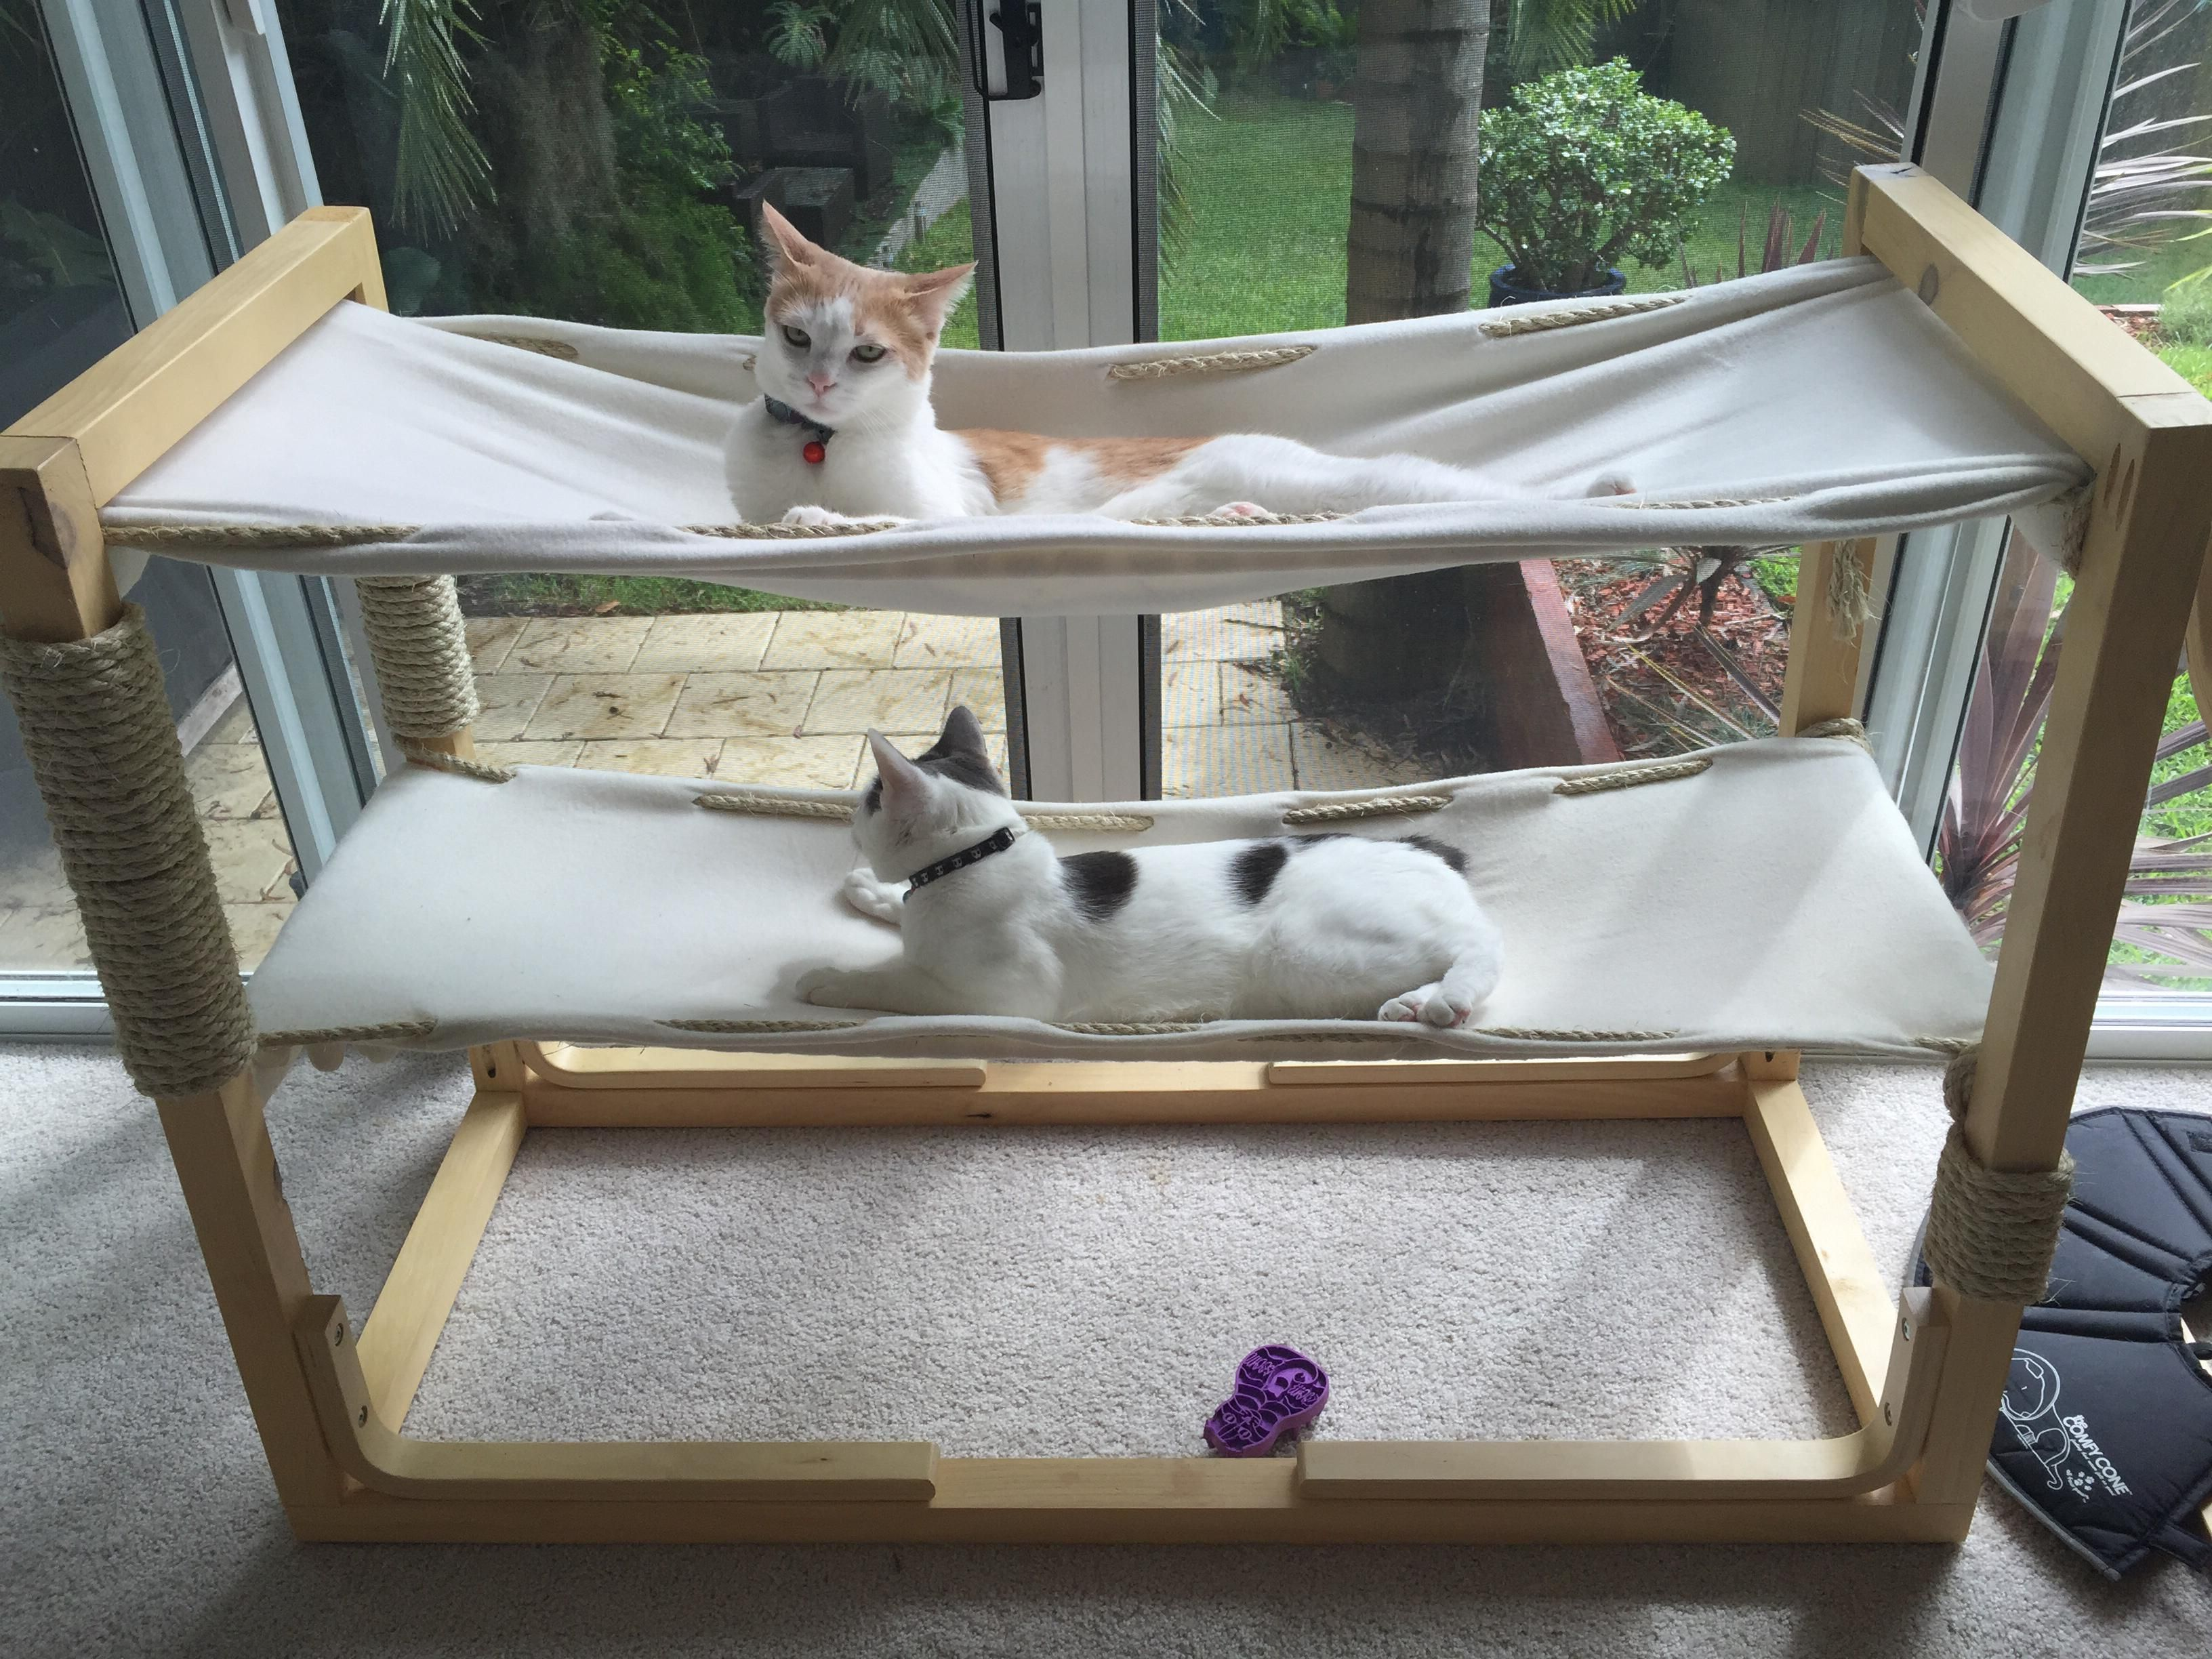 Build Bunk Bed Hammocks for Your Cats Diy cat hammock